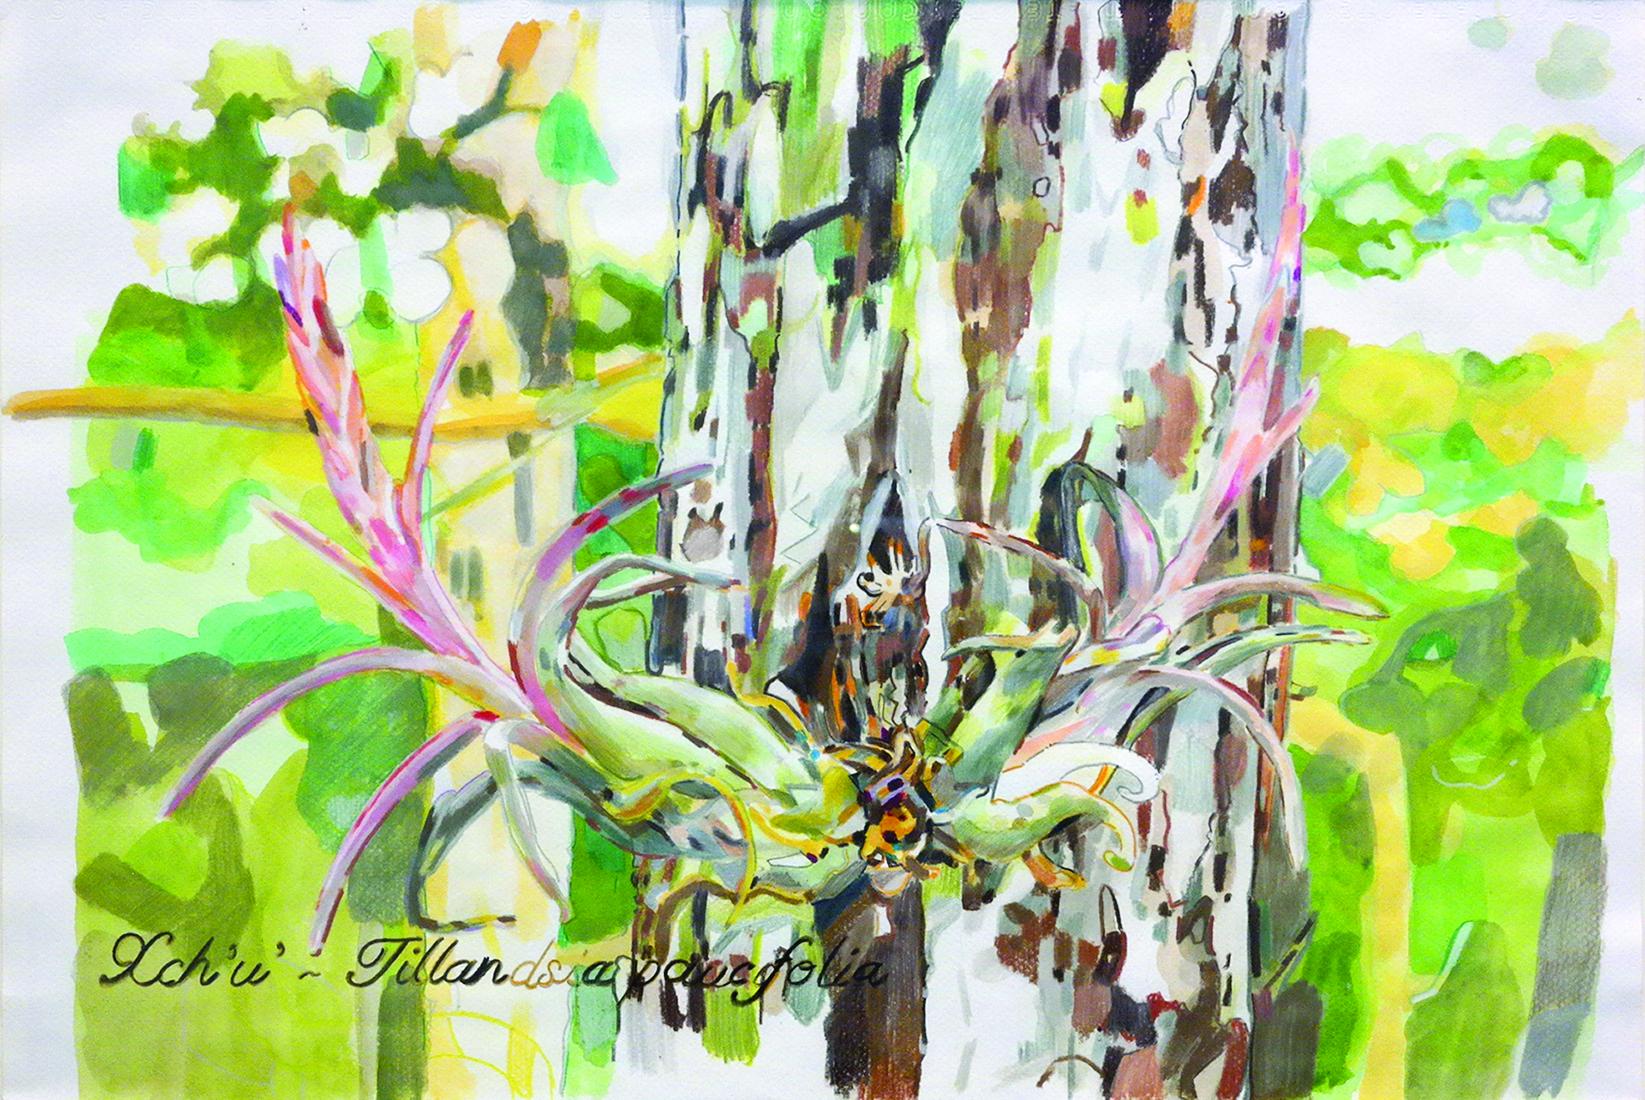 Xch'u' (Tillandsia paucifolia), 37x55cm, lápiz a color sobre papel,  2014, $27, 000.jpg